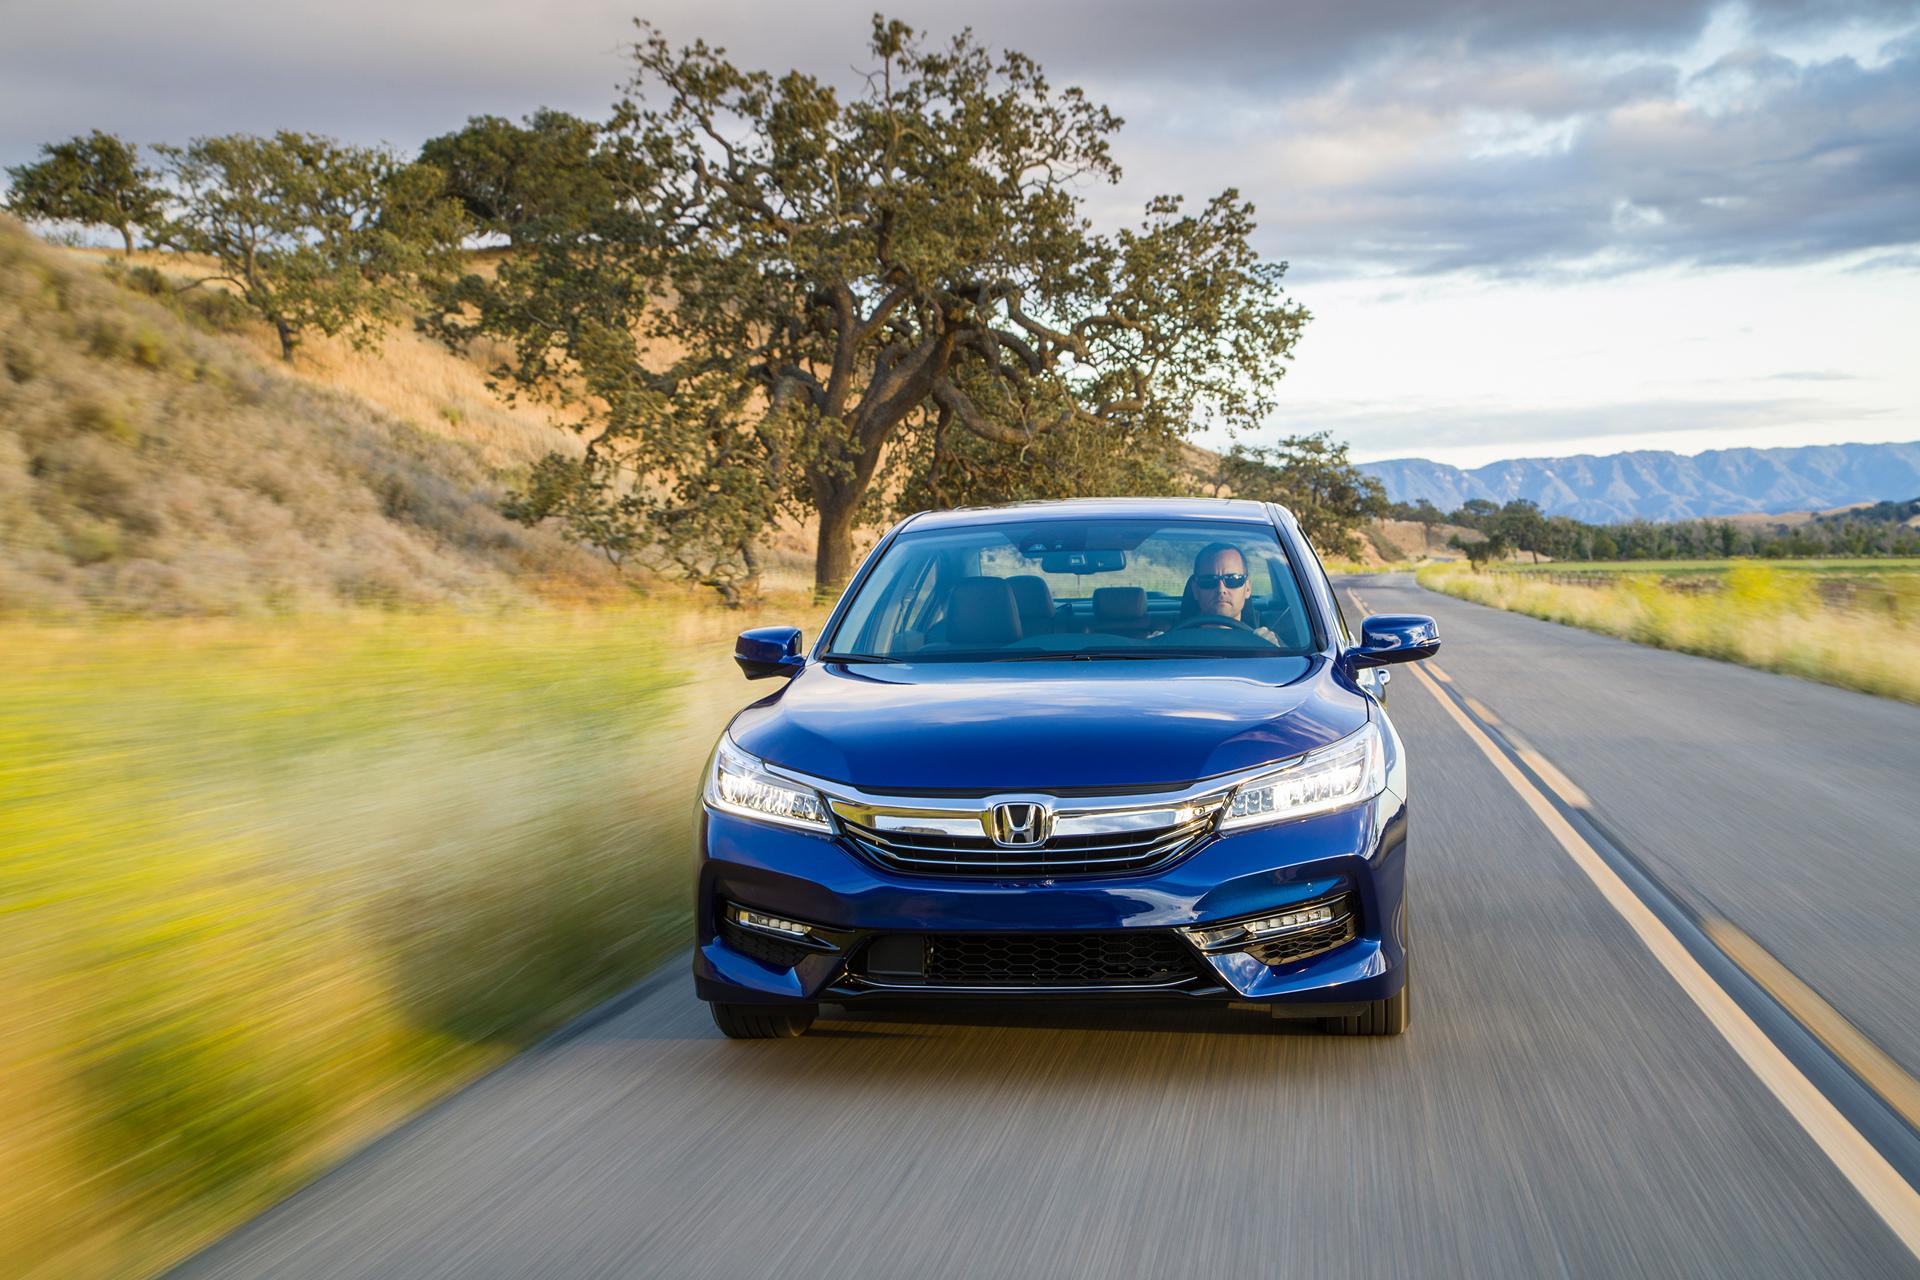 2017 Honda Accord Hybrid © Honda Motor Co., Ltd.